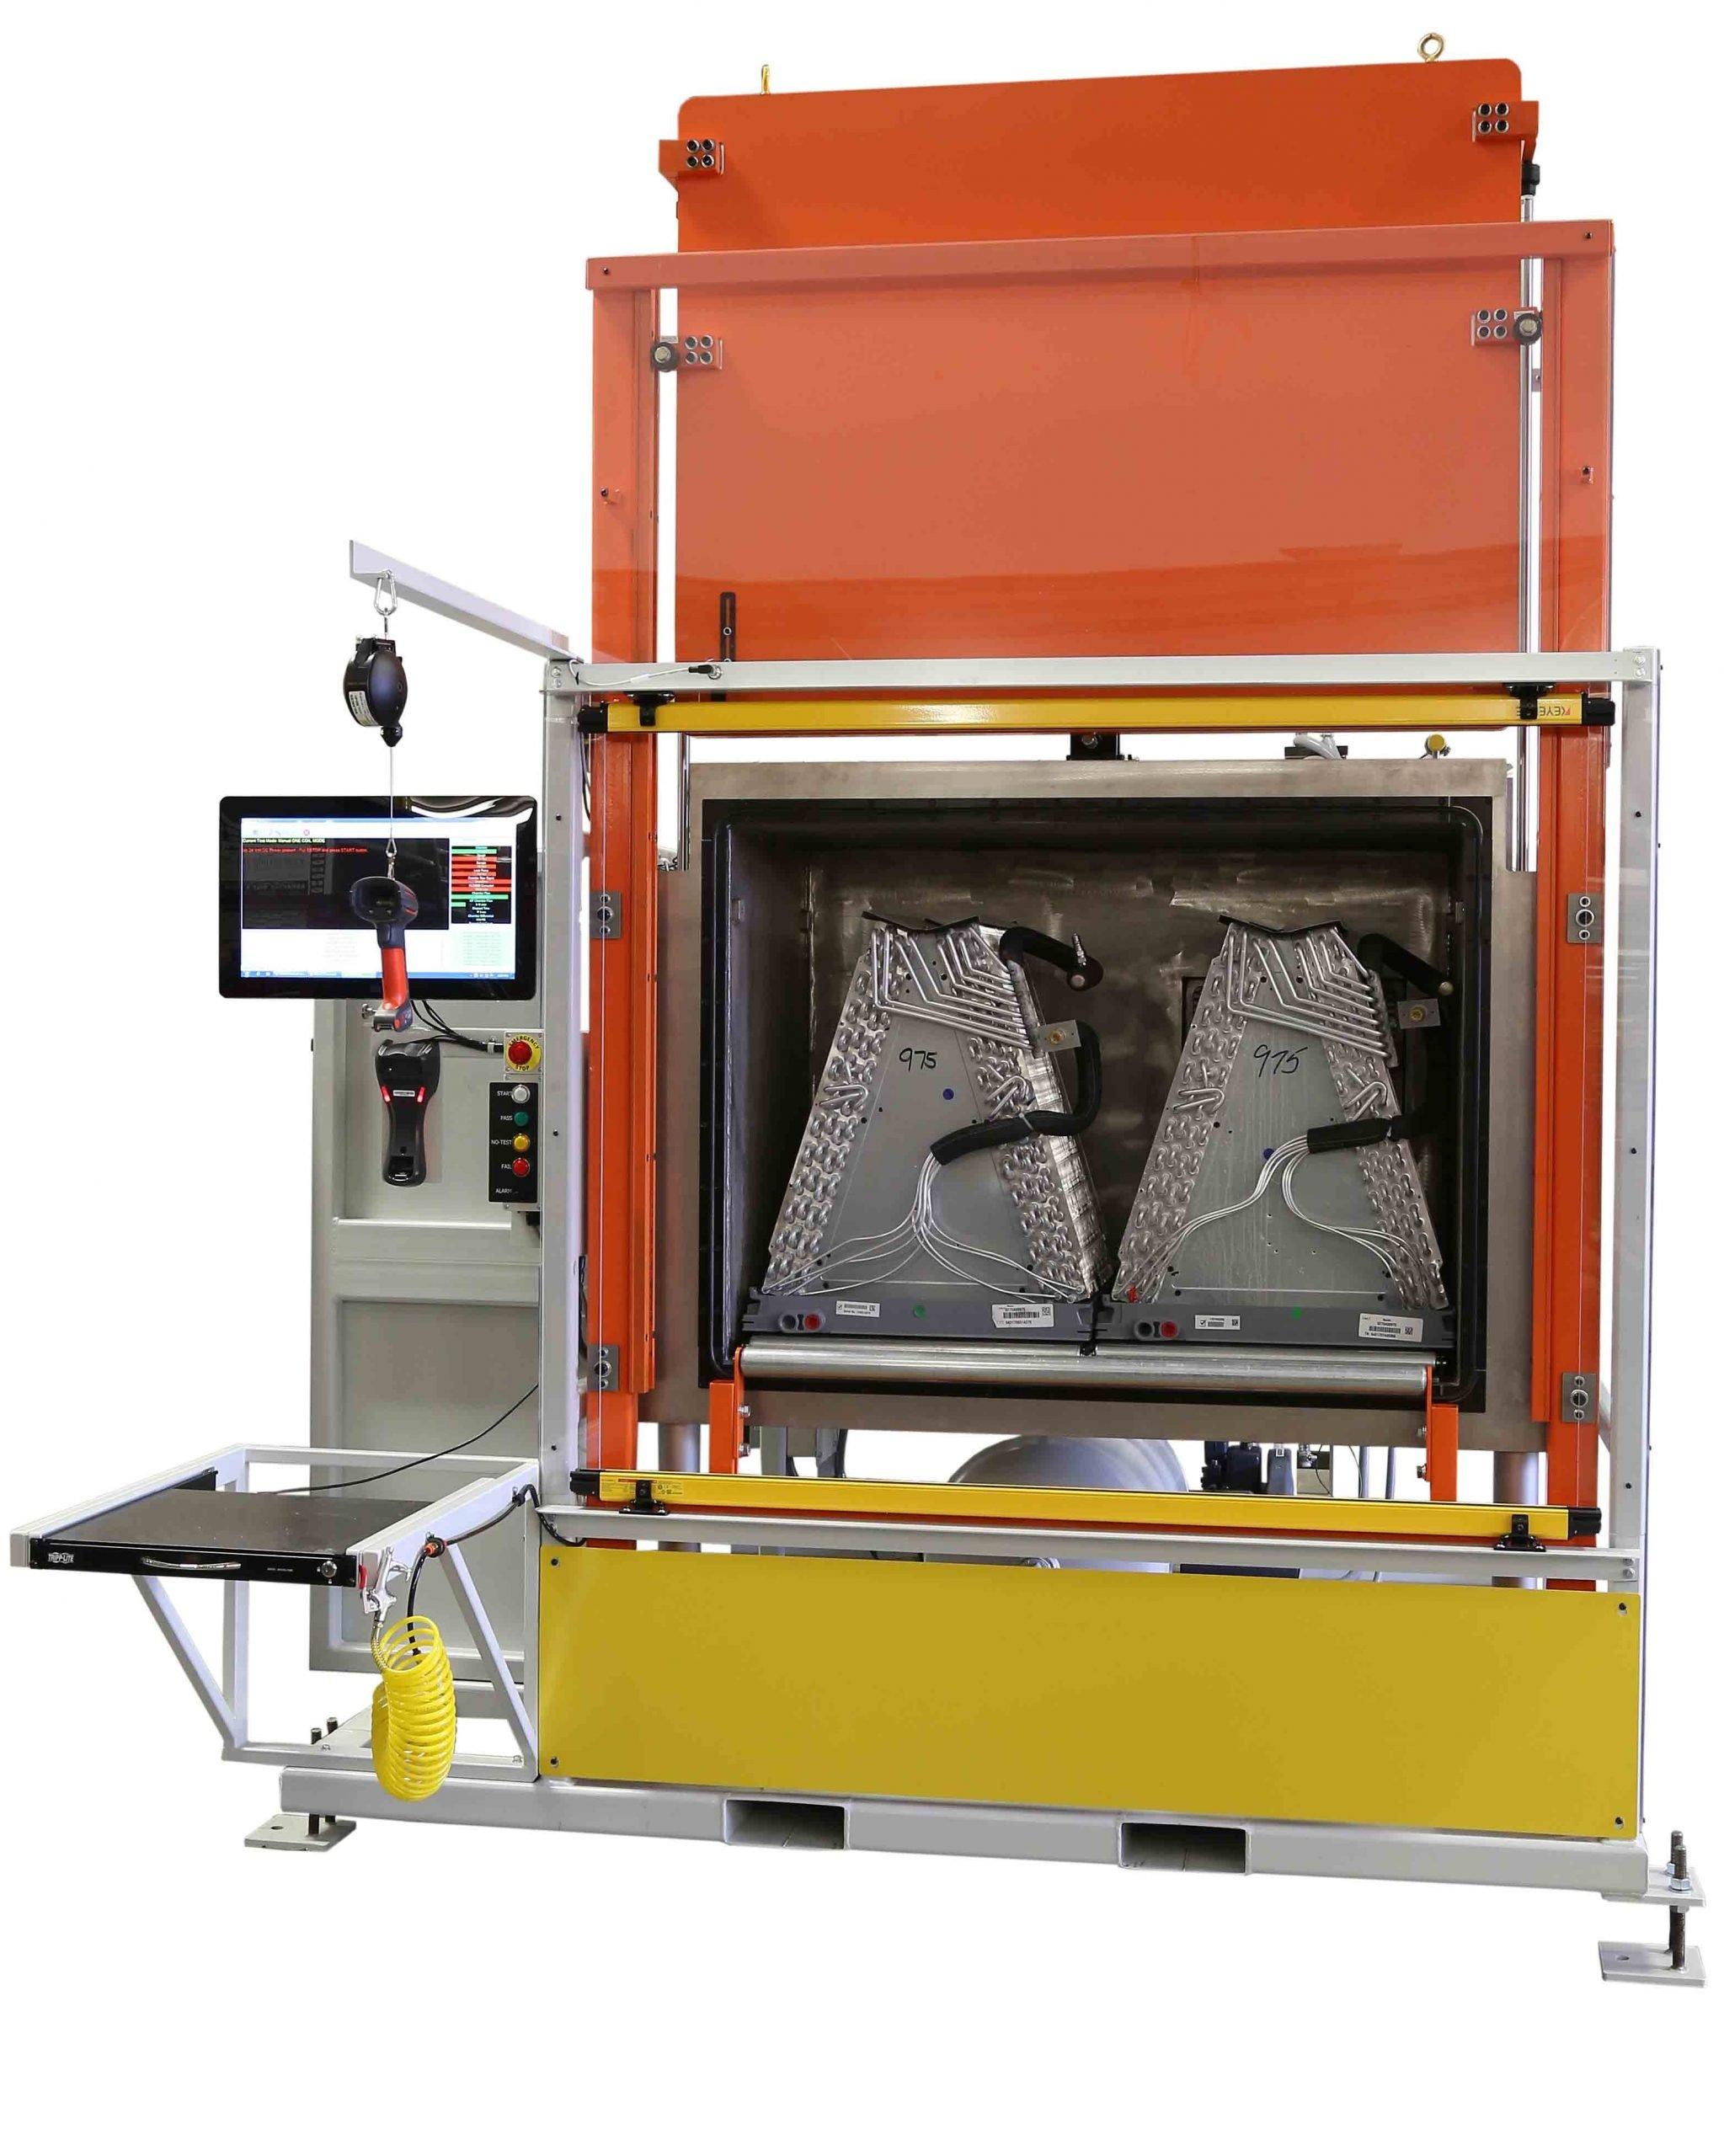 VTI's HounDog Refrigerant Leak Test Station for A-Coil Manufacturing